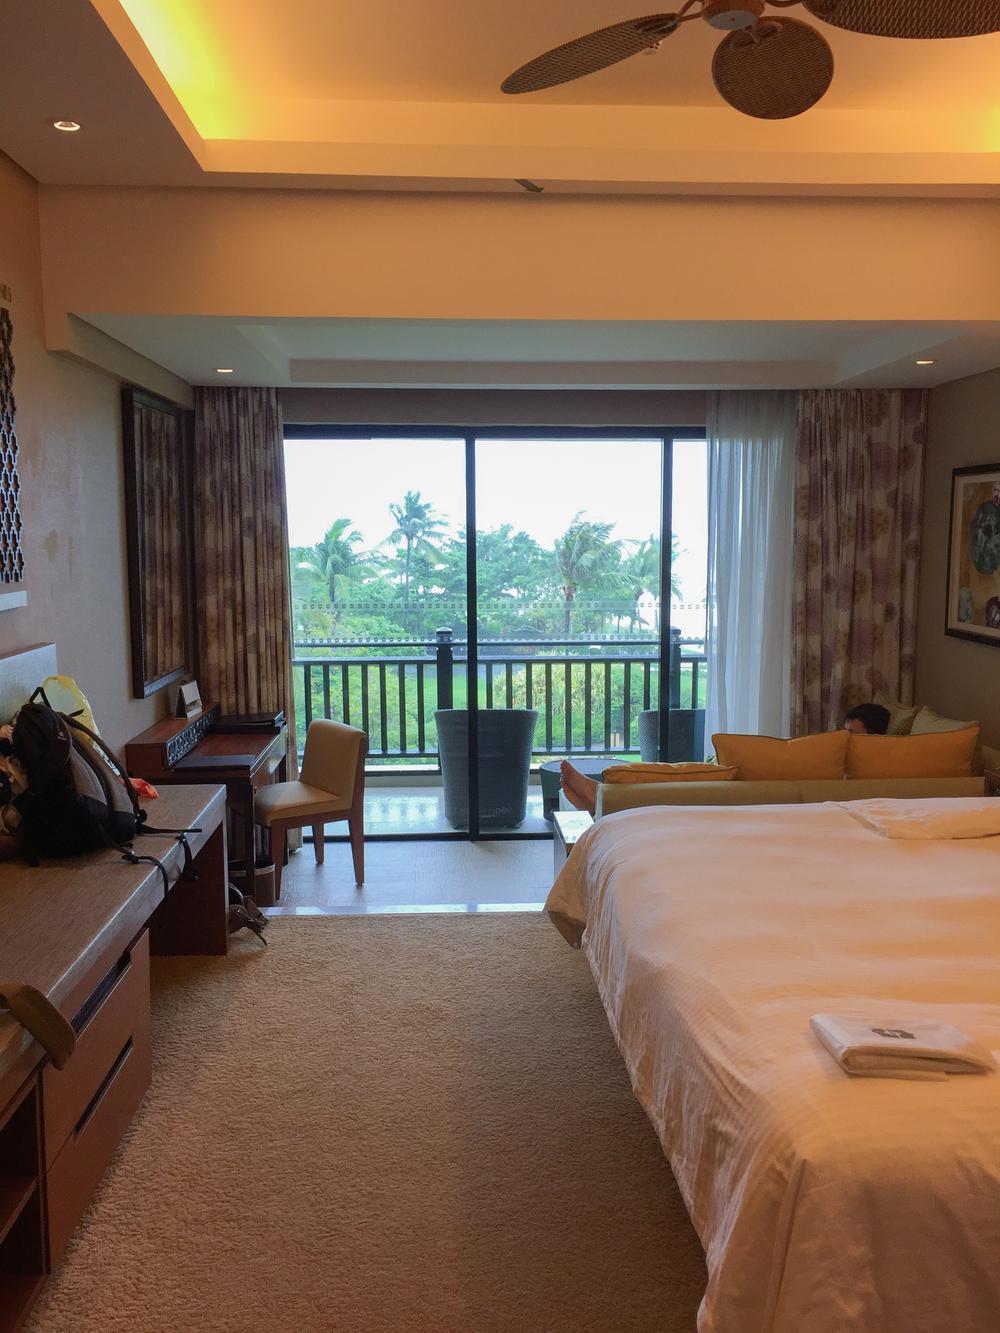 Shangri La Rasa Ria Resort Borneo Malaysia Kota Kinabalu (6 of 23).JPG